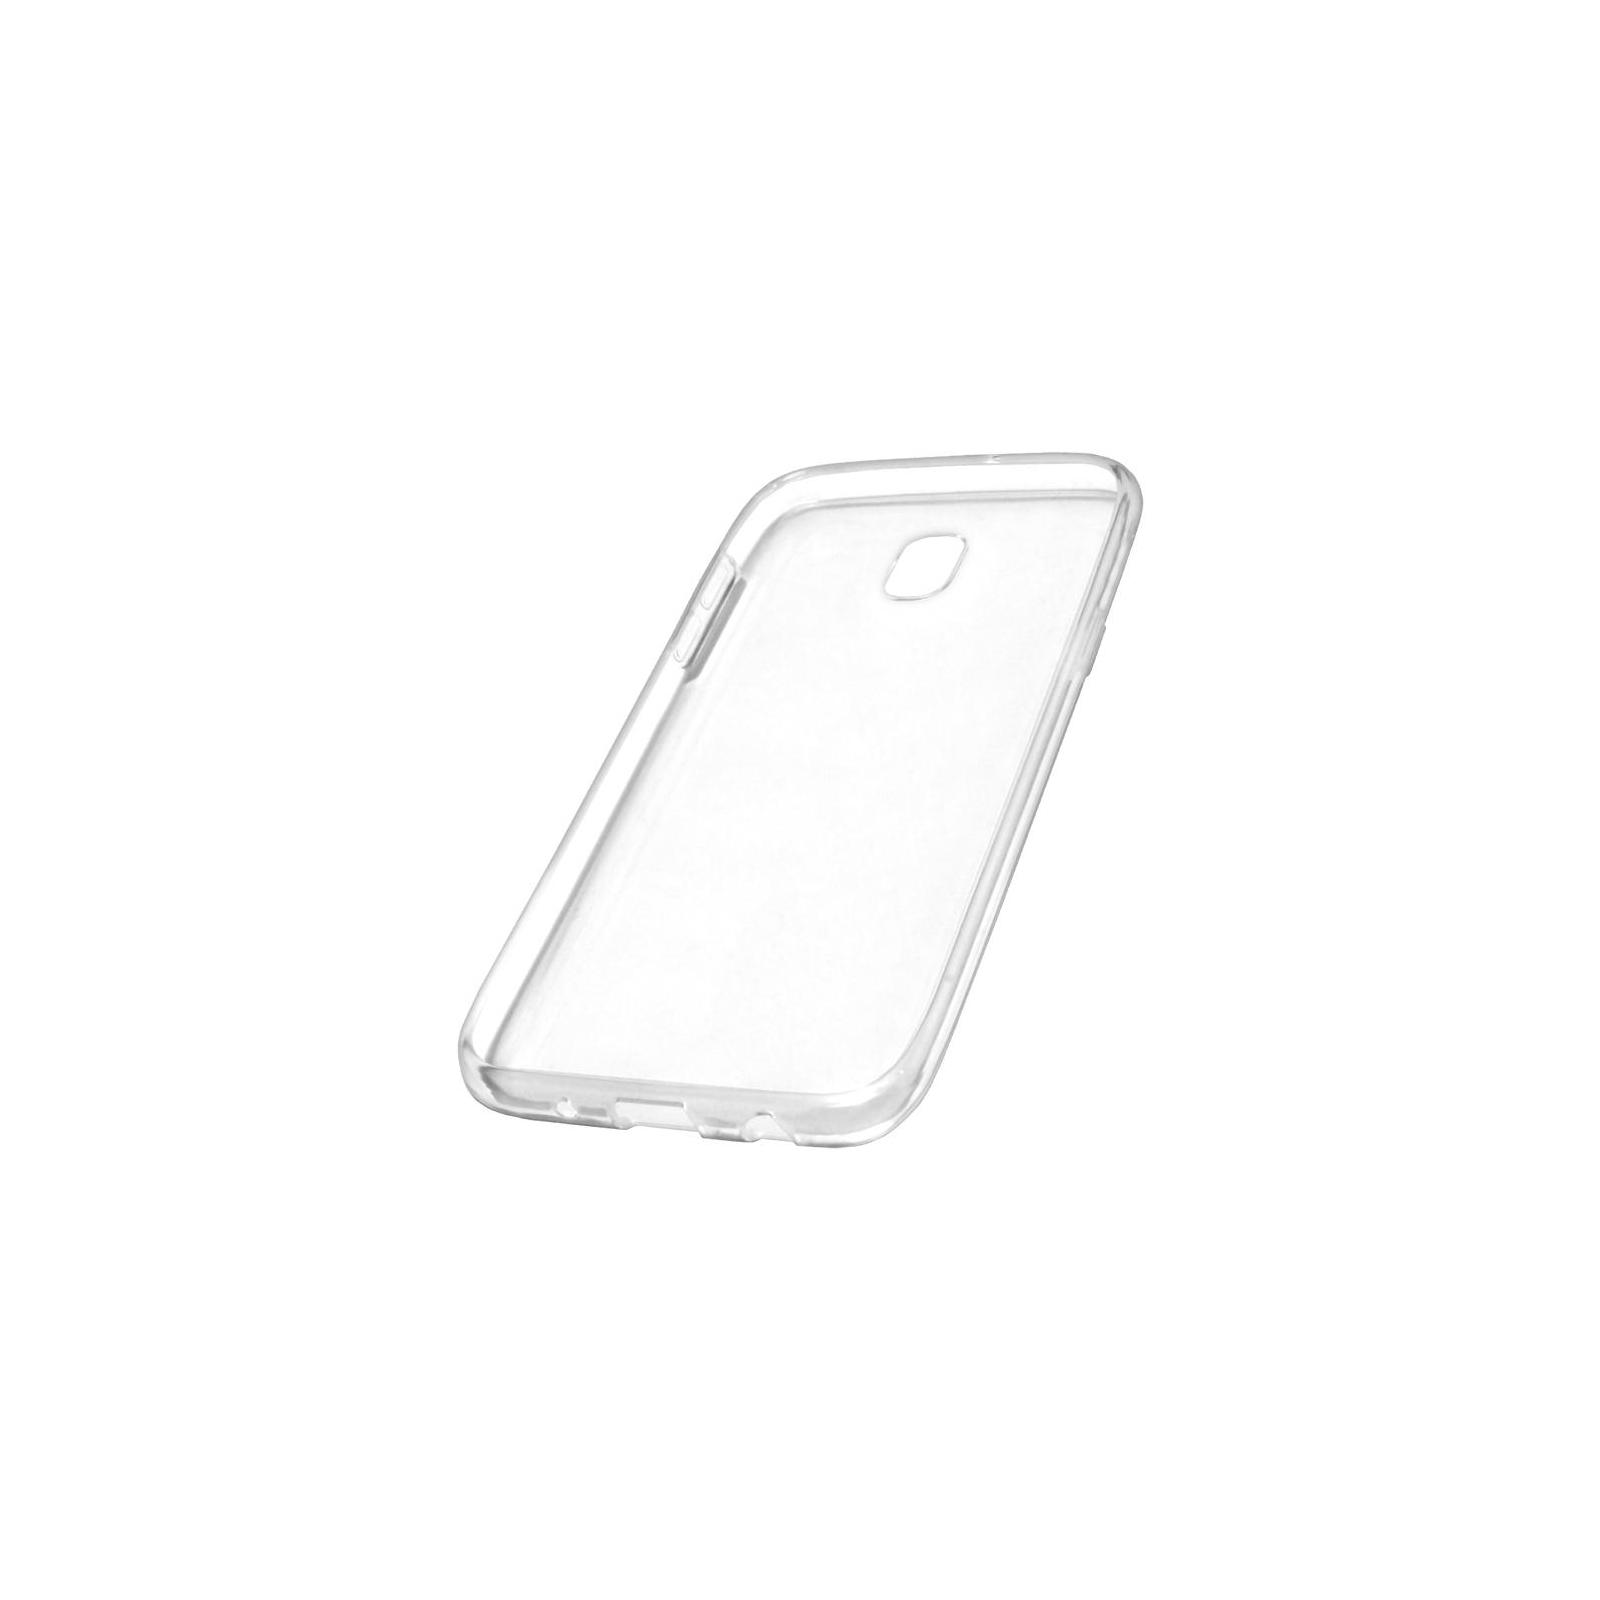 Чехол для моб. телефона SmartCase Samsung Galaxy J7 / J730 TPU Clear (SC-J730) изображение 2